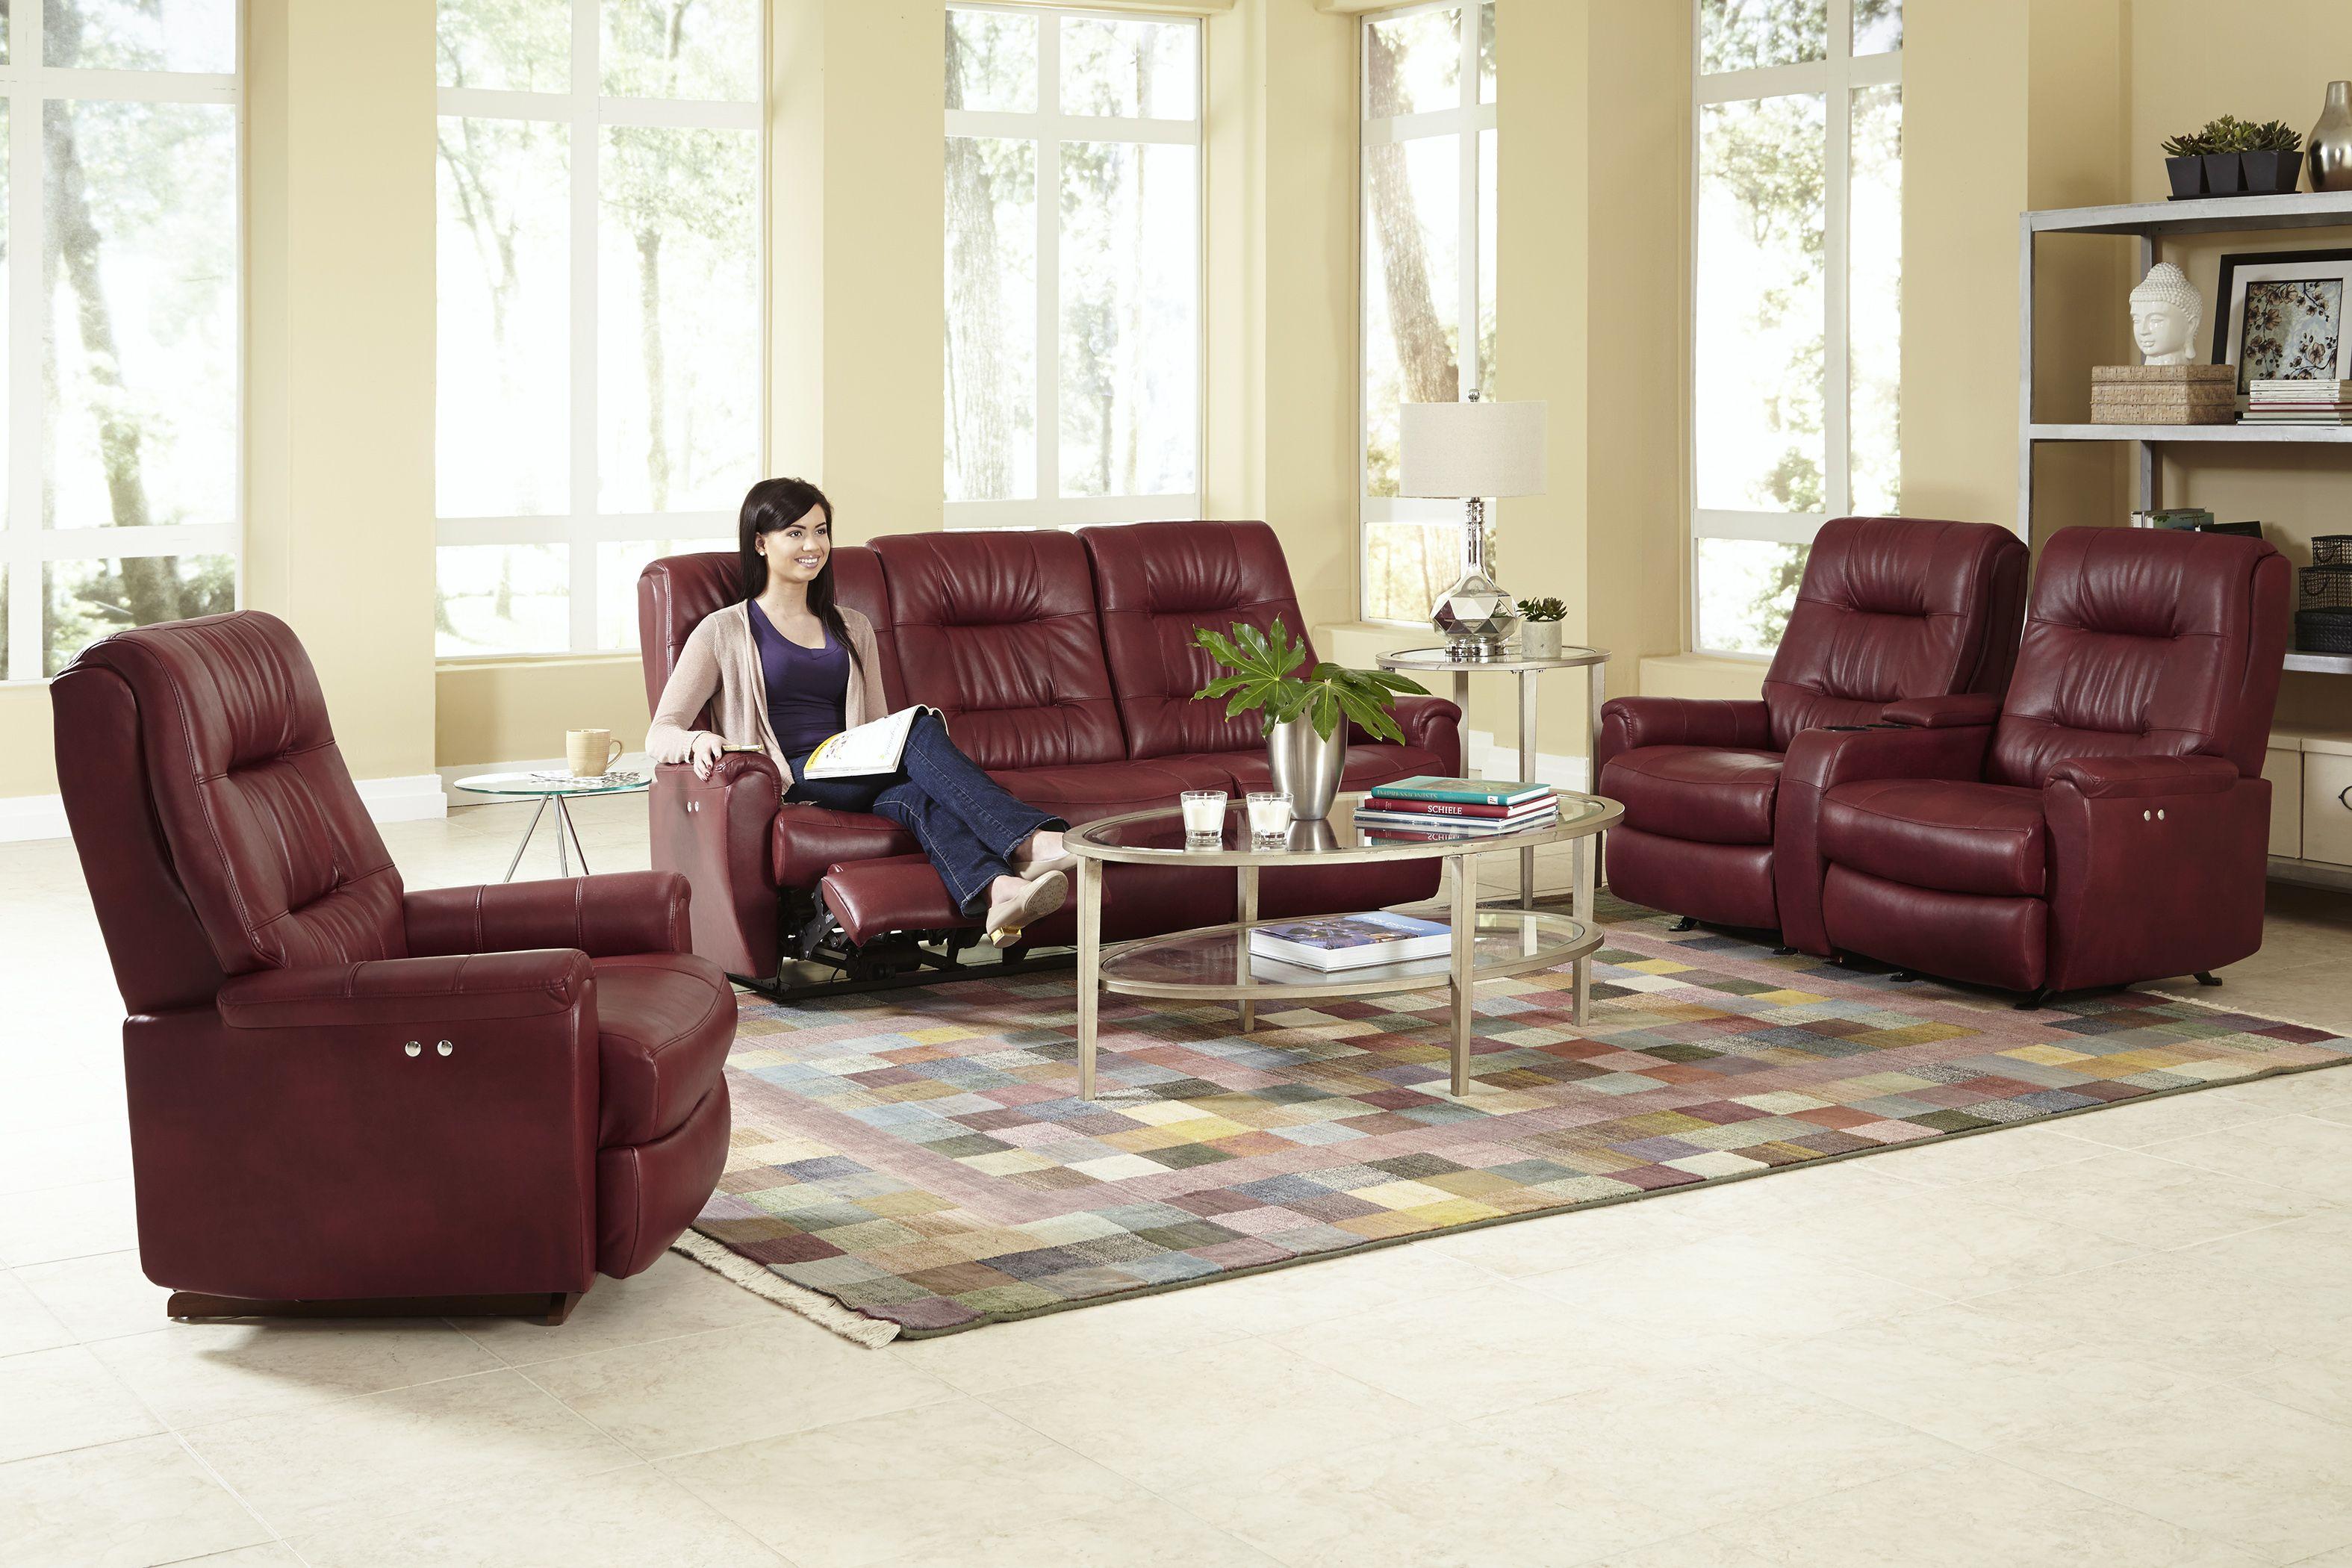 Prime Felicia Collection Best Home Furnishings Goods Home Inzonedesignstudio Interior Chair Design Inzonedesignstudiocom